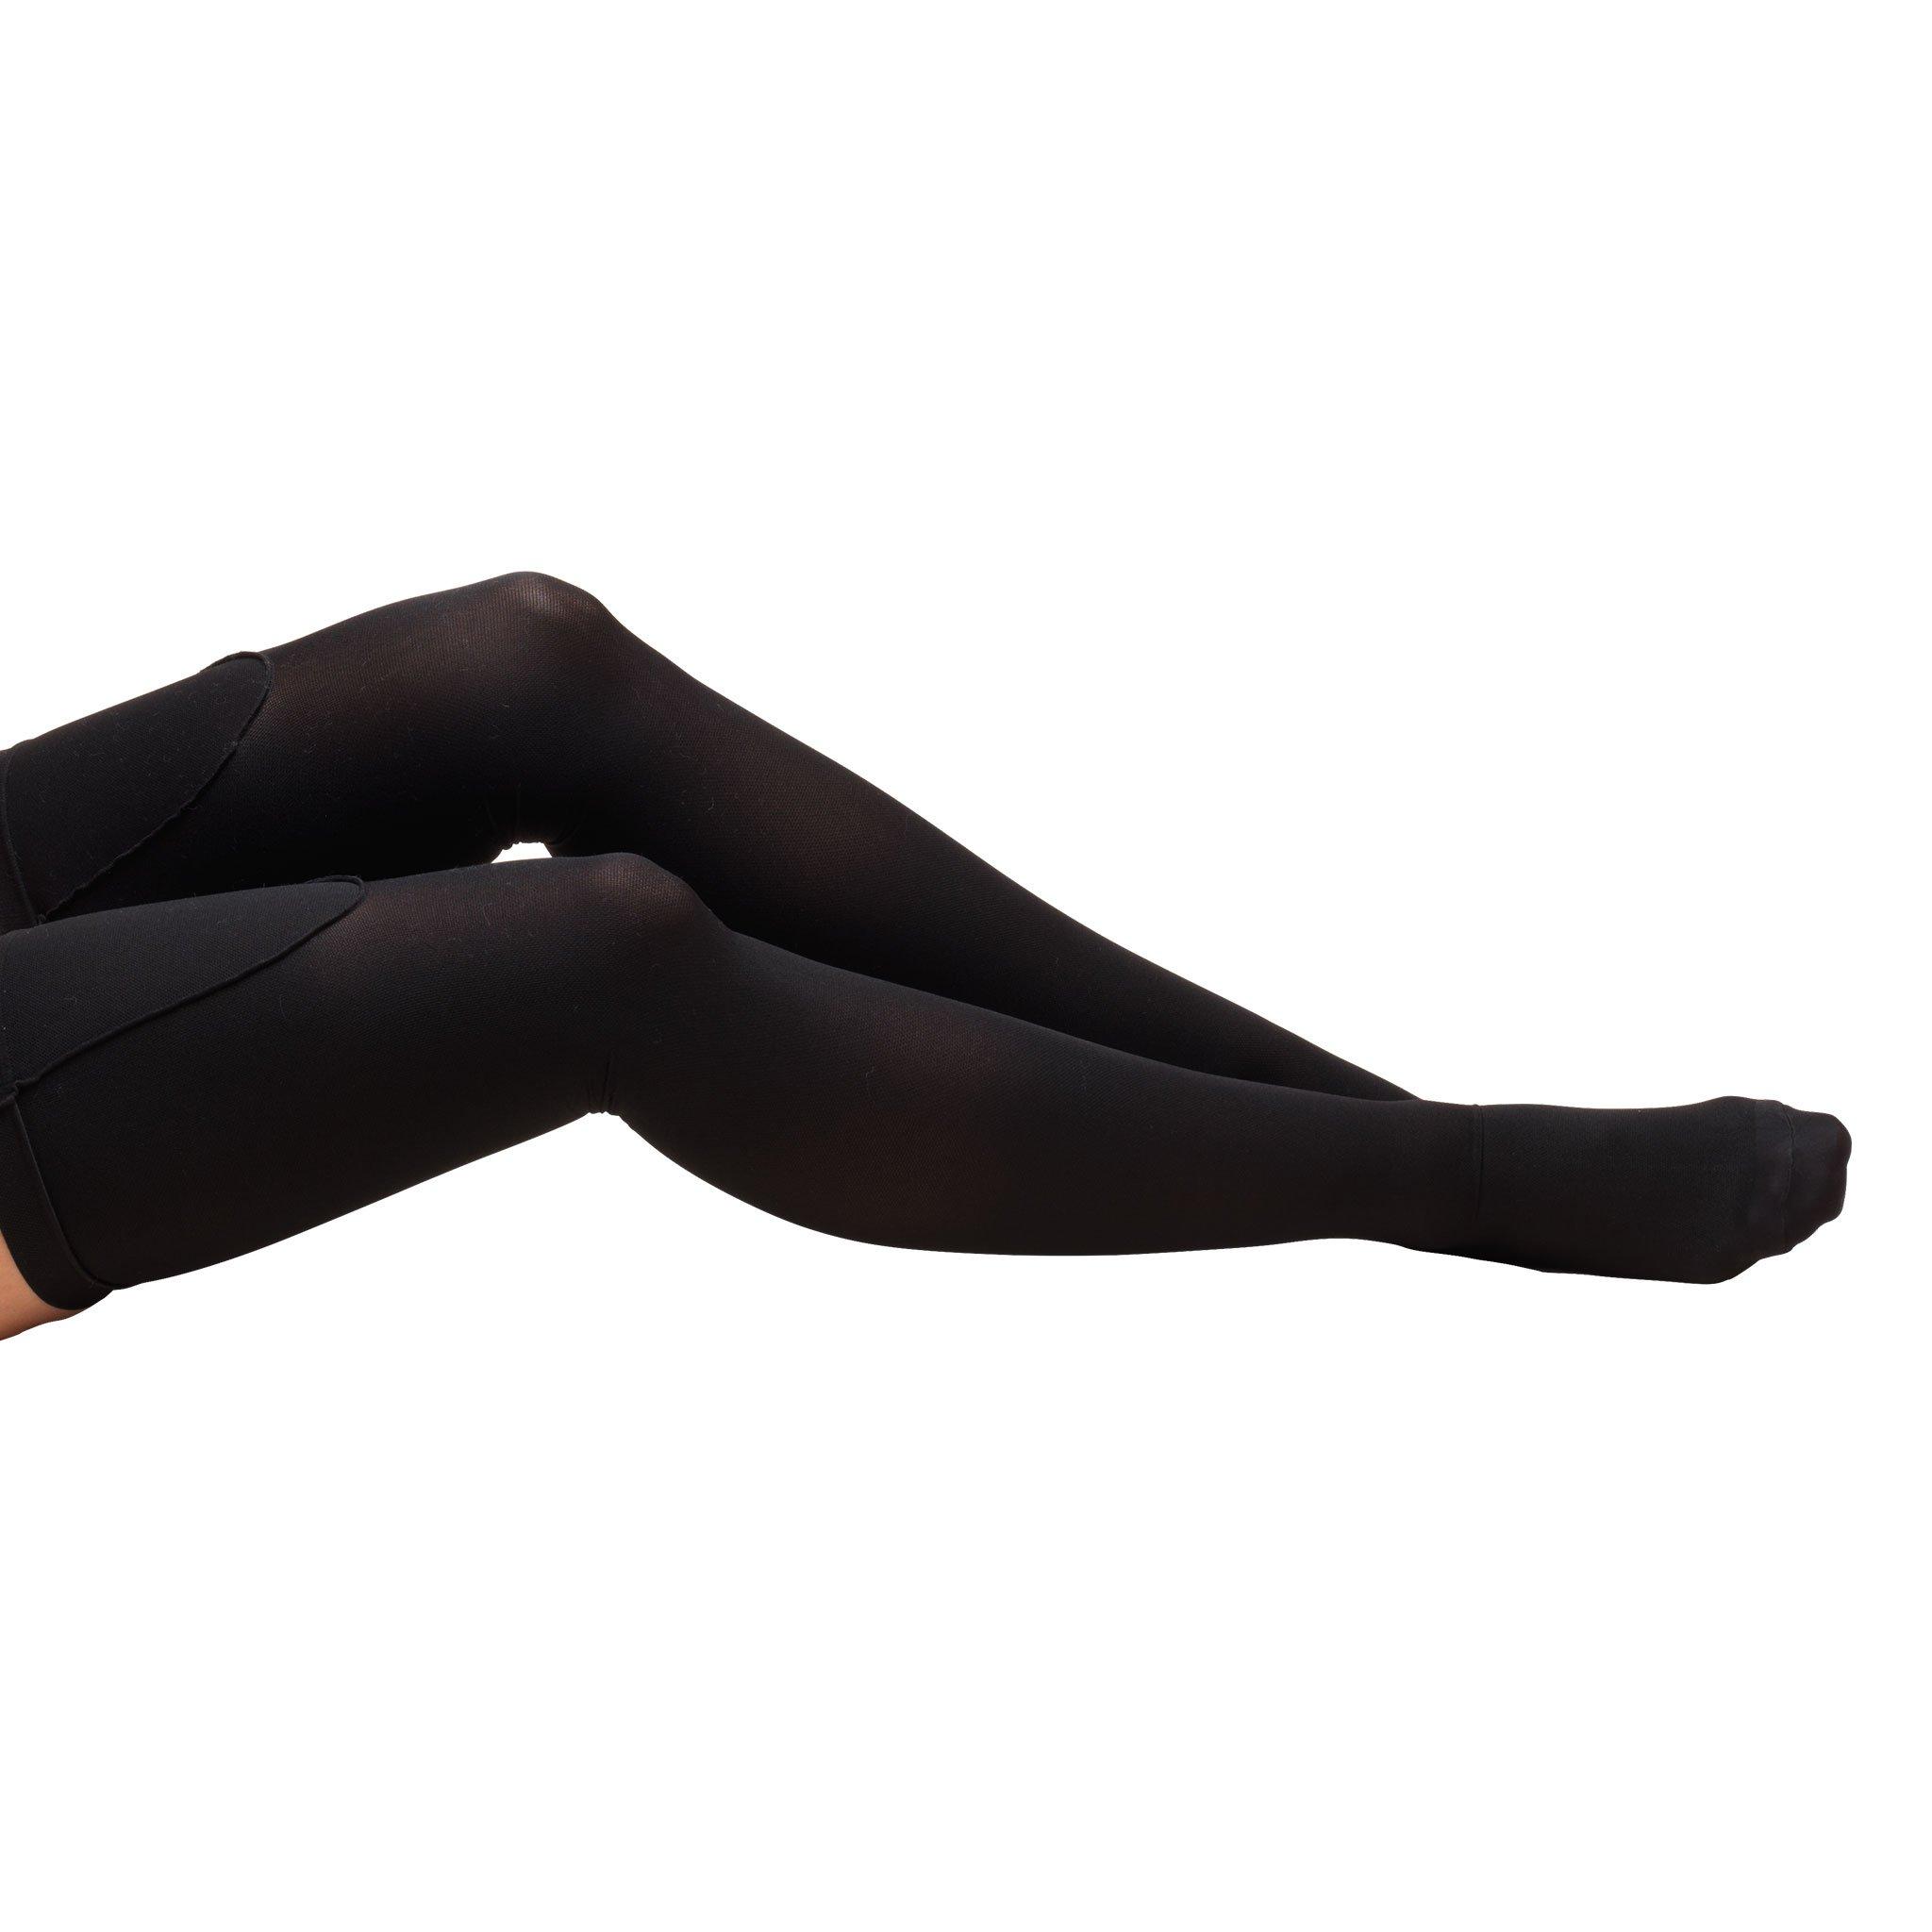 Truform Closed Toe, Thigh High 18 mmHg Anti-Embolism Stockings, Black, X-Large